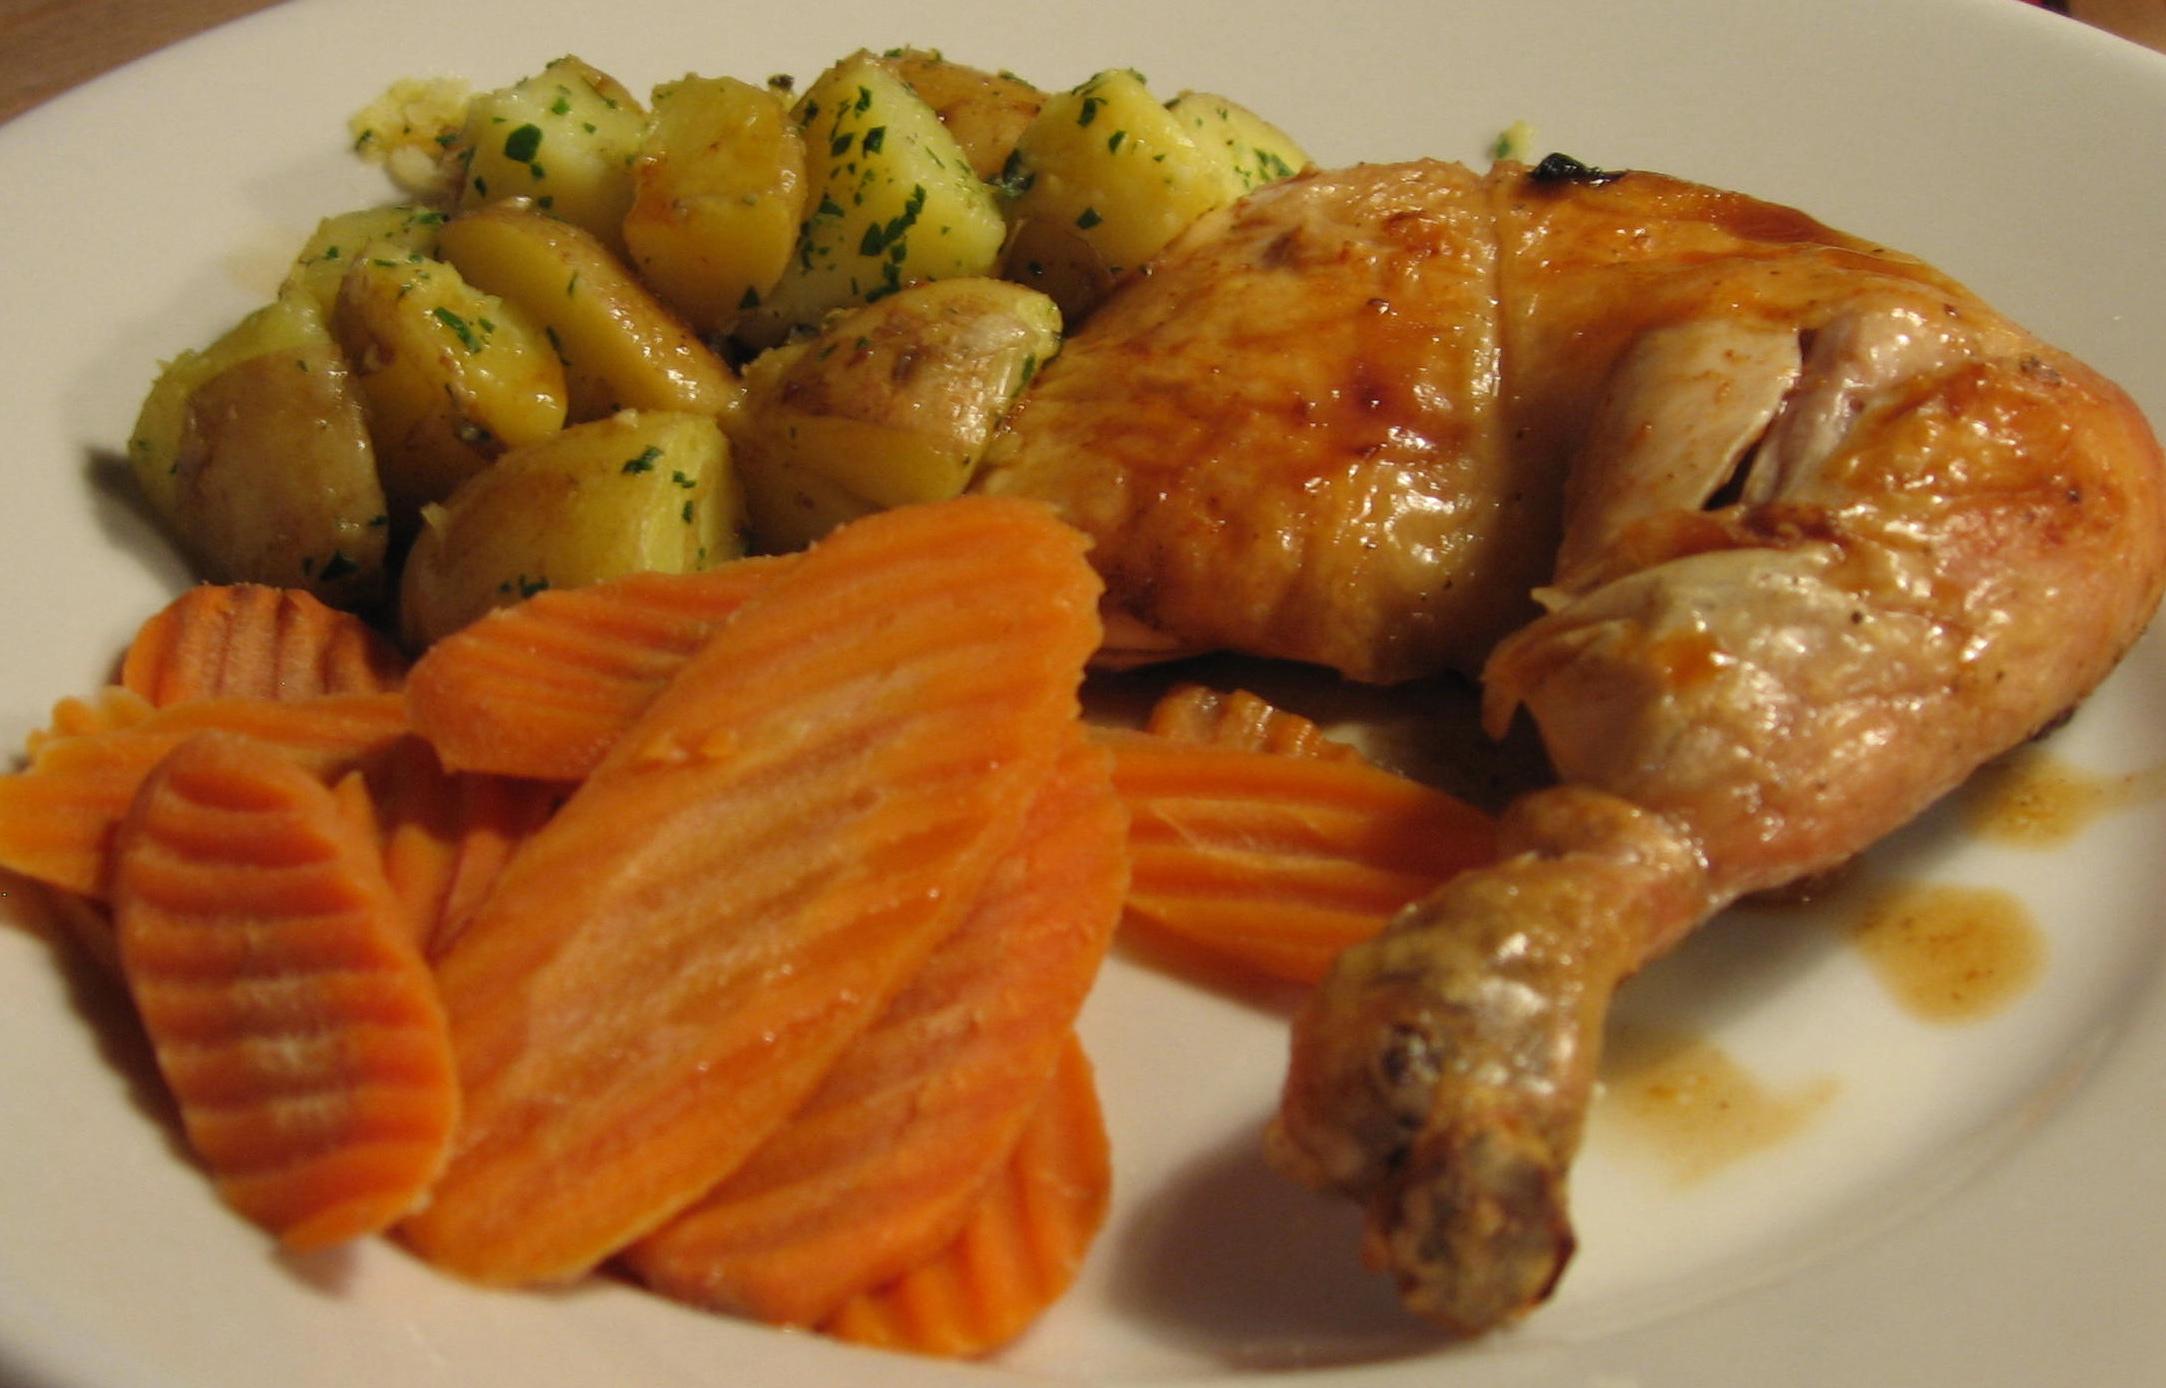 Roast chicken recipe in french